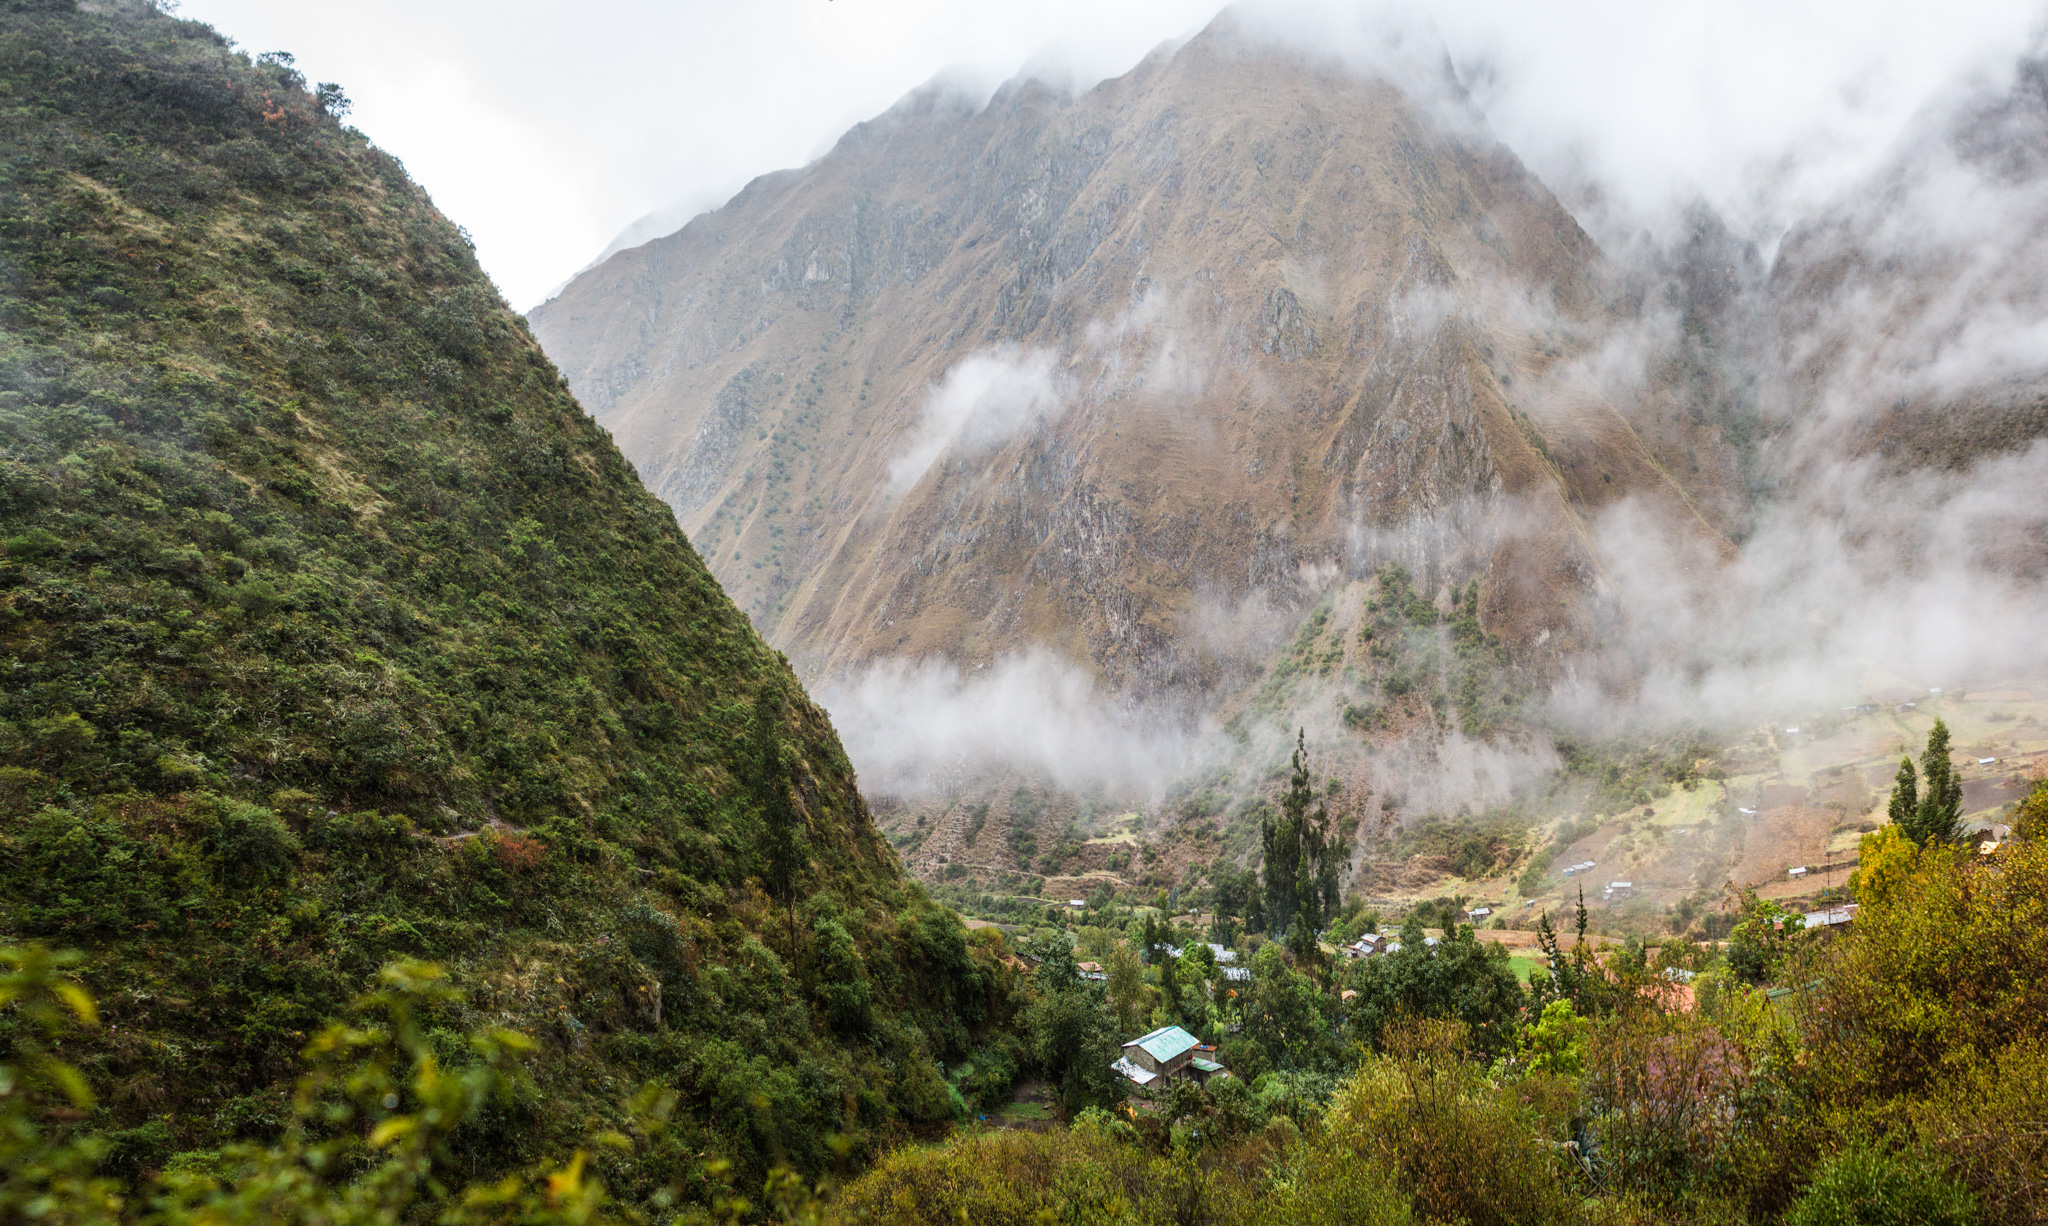 Ali-Barqawi-Studios-Explore-Series-Travel-Adventure-Documentary-C4CGAZA-Peru-MachuPicchu-2015-142.jpg